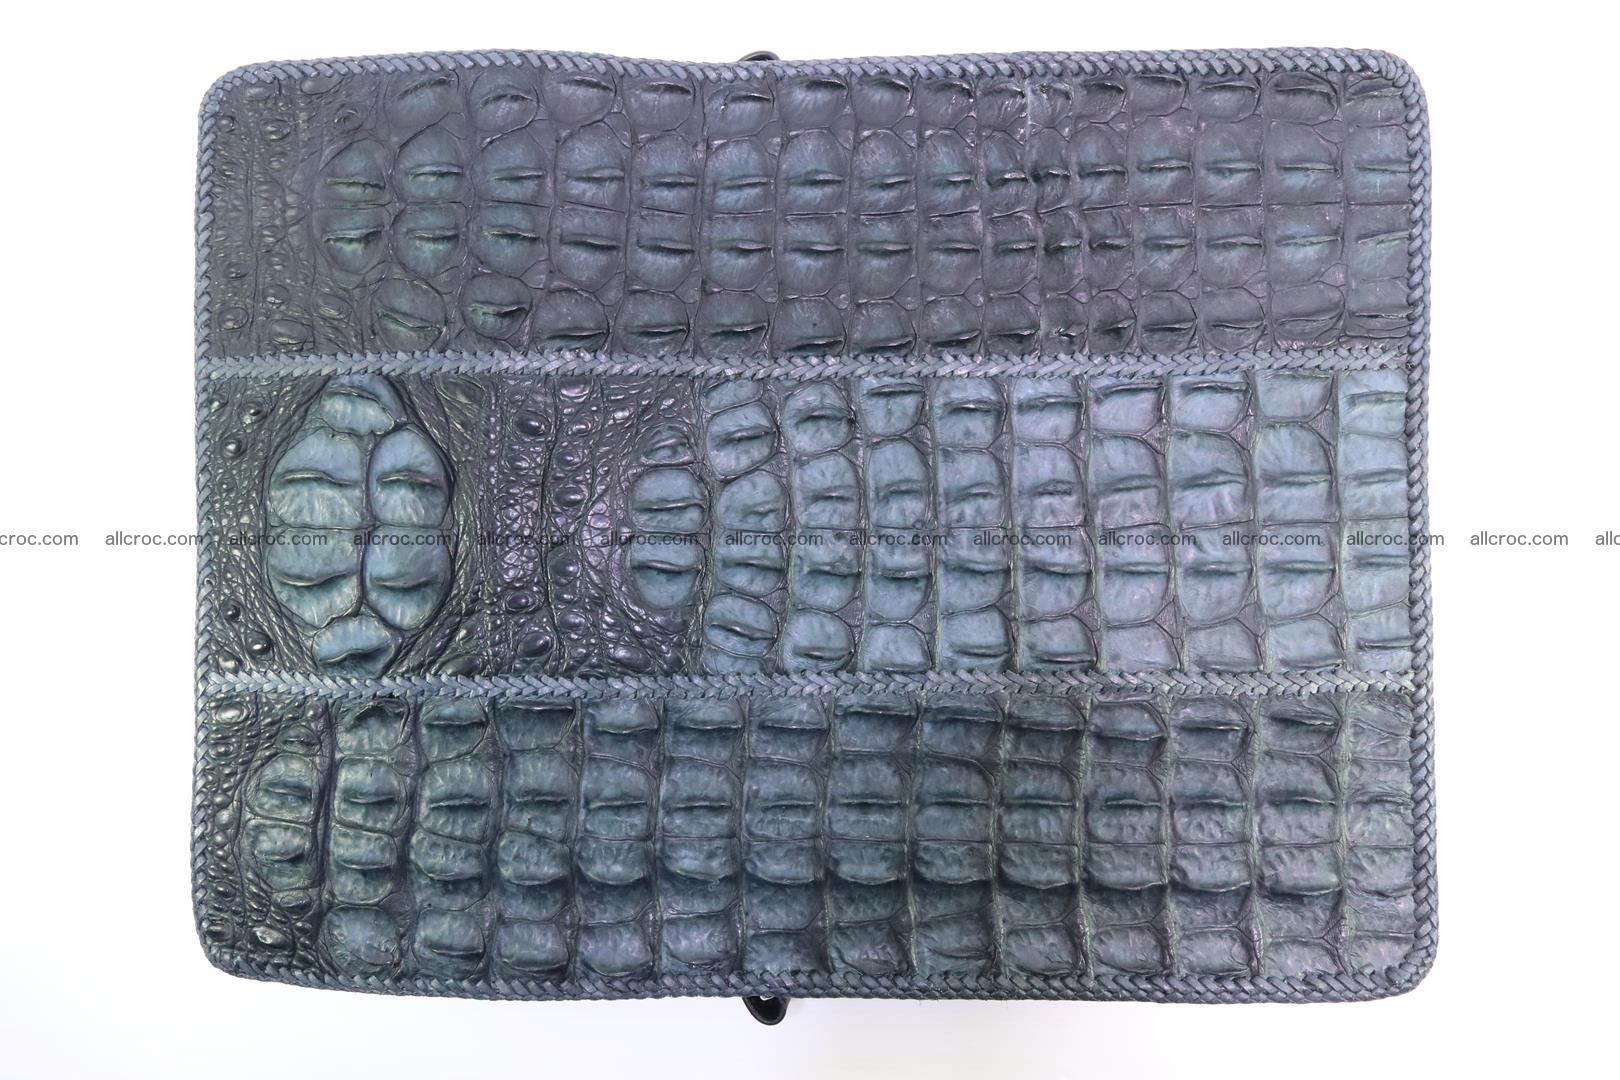 Crocodile skin shoulder bag with braided edges 146 Foto 13